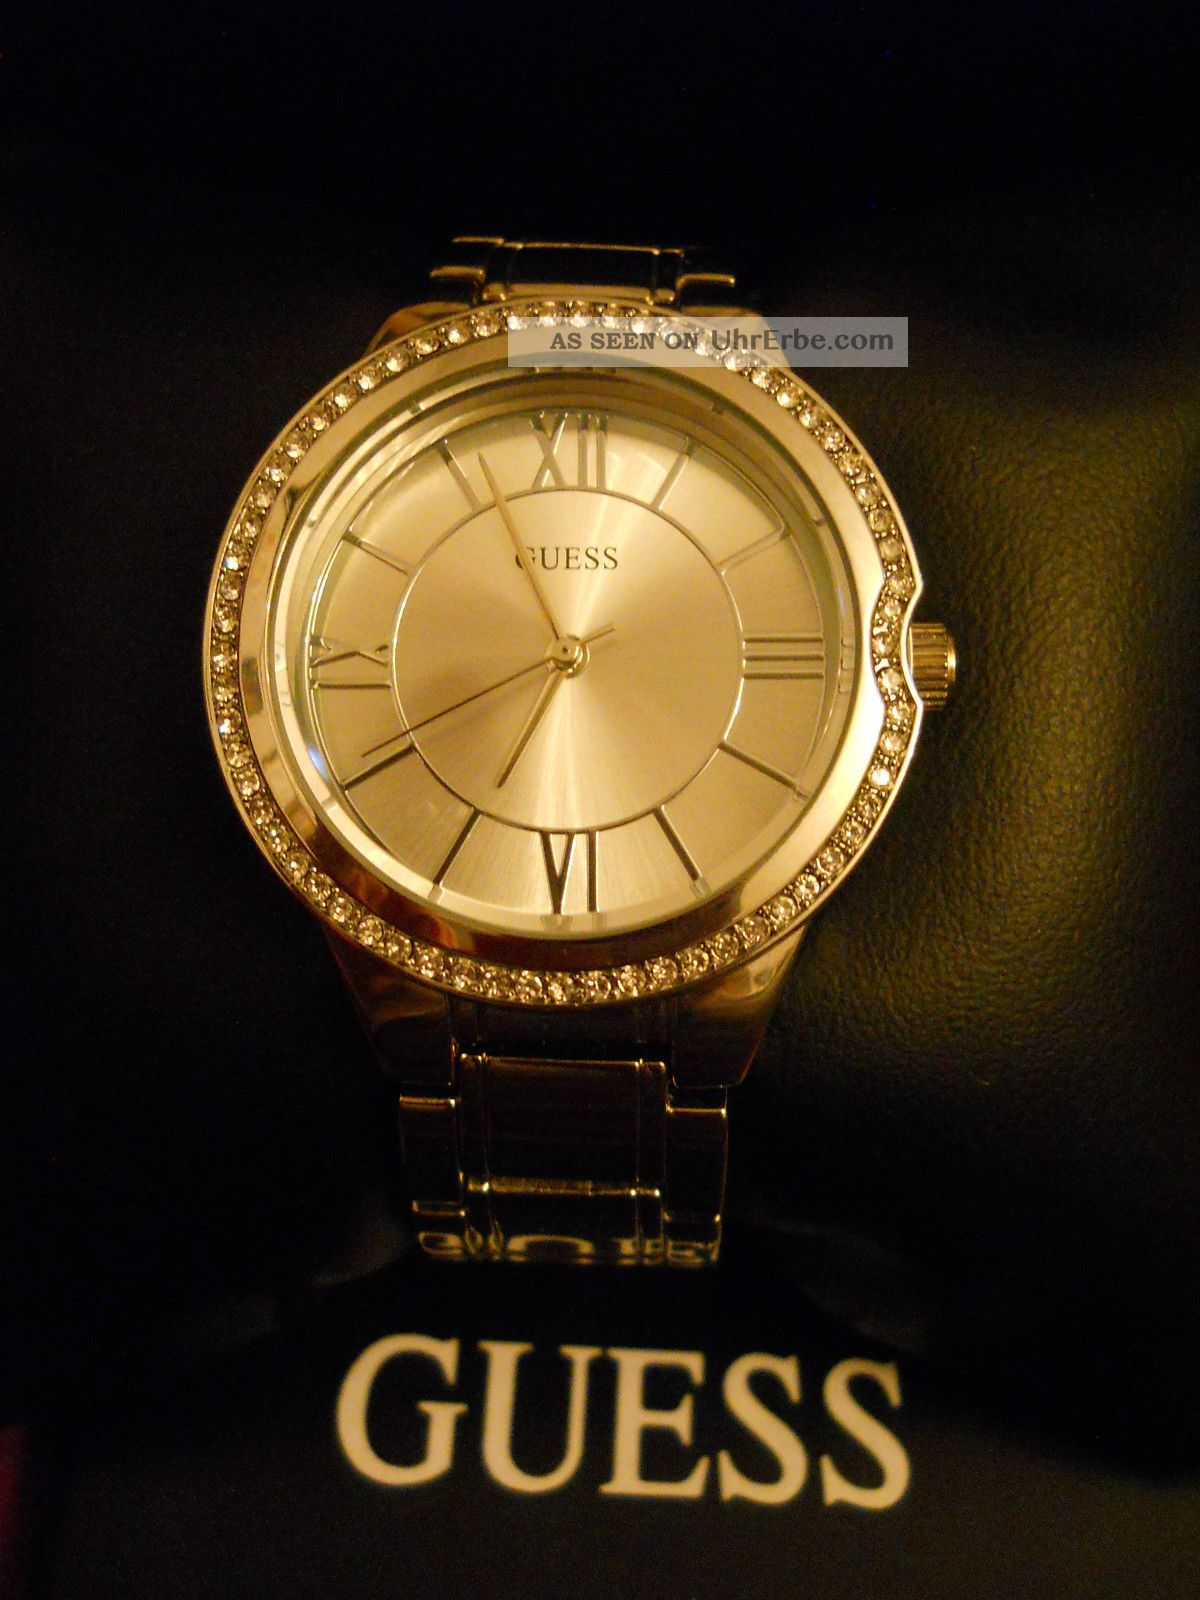 Guess Uhr Wie Moonbeam Nur Zifferblatt Silber Statt Perlmutt Kristalle Armbanduhren Bild